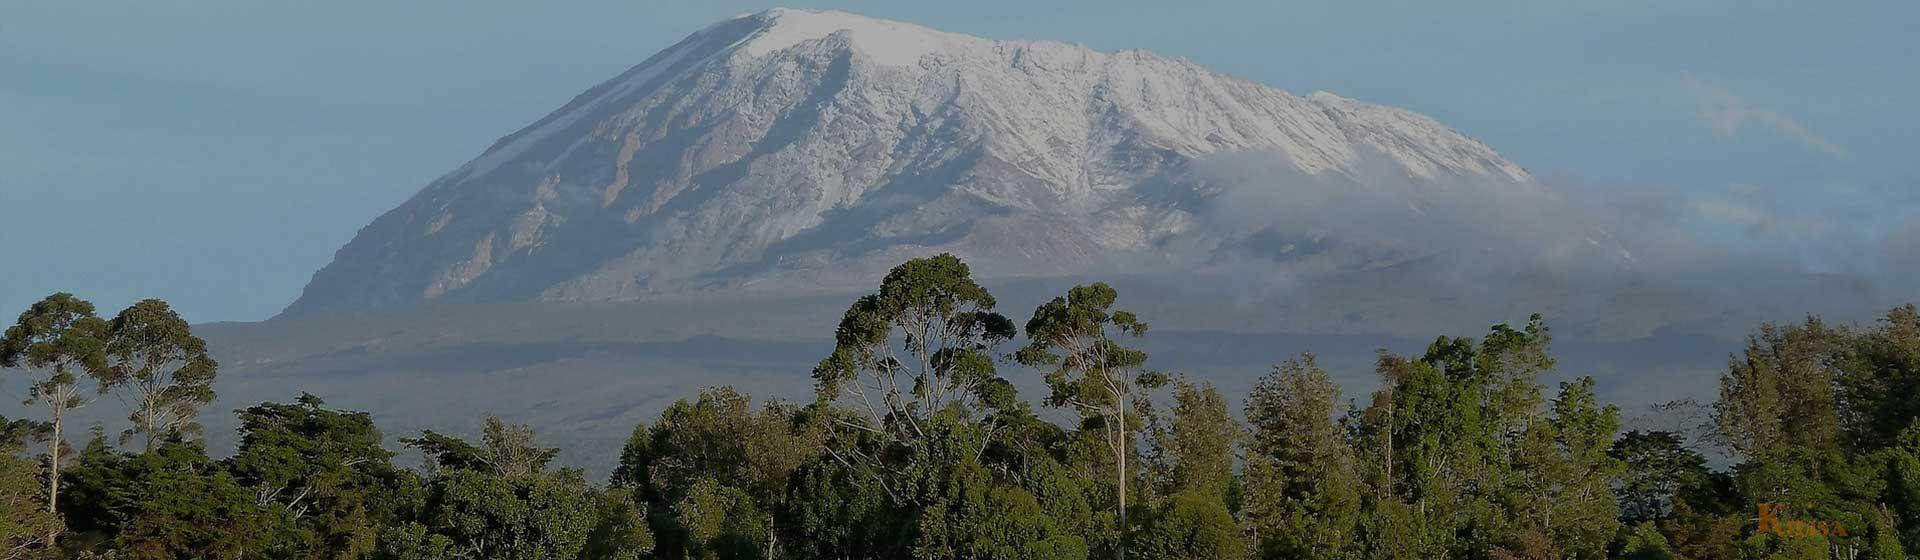 Kilimanjaro Weather